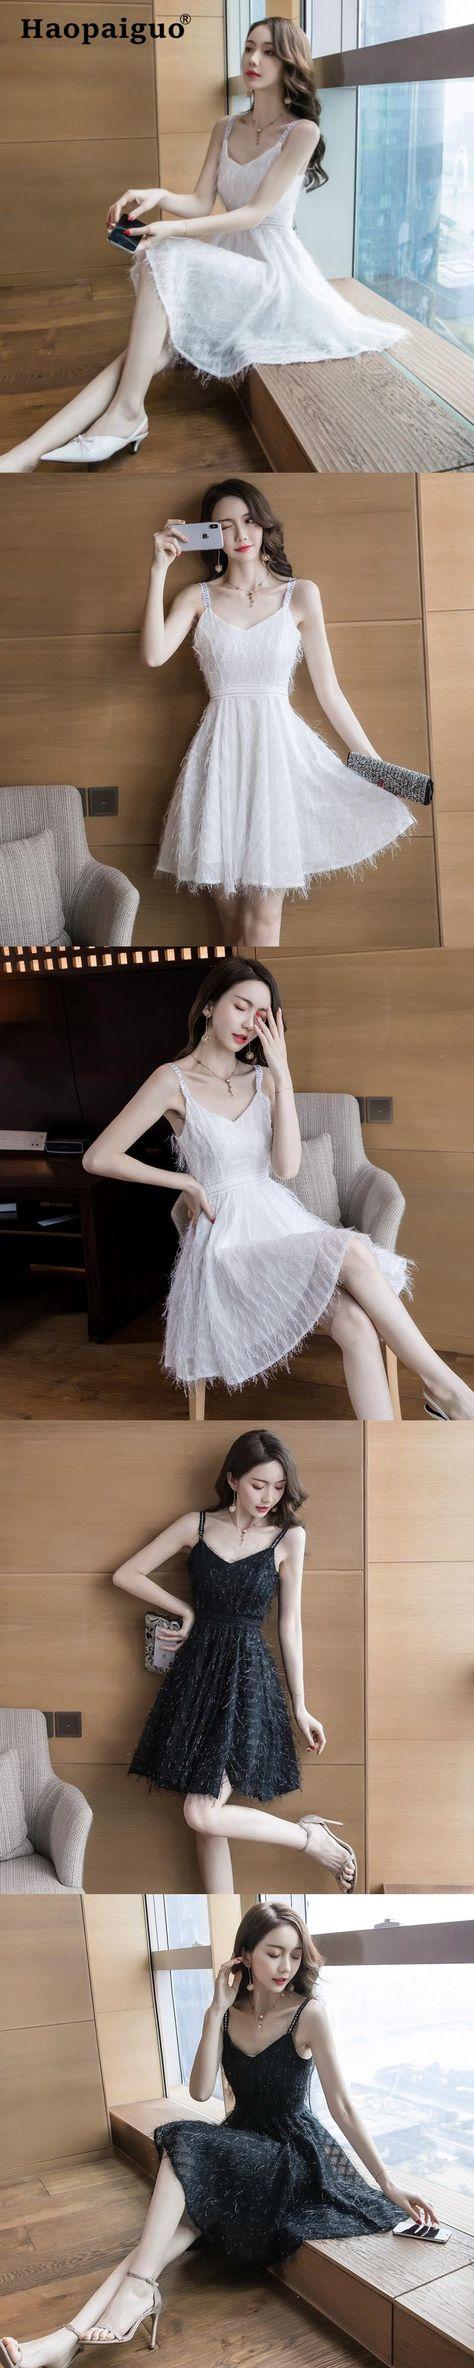 aff79a02b6db Plus Size Big Swing Sexy Party Dress Women Spaghetti Strap White Club  Dresses Ladies with Tassel